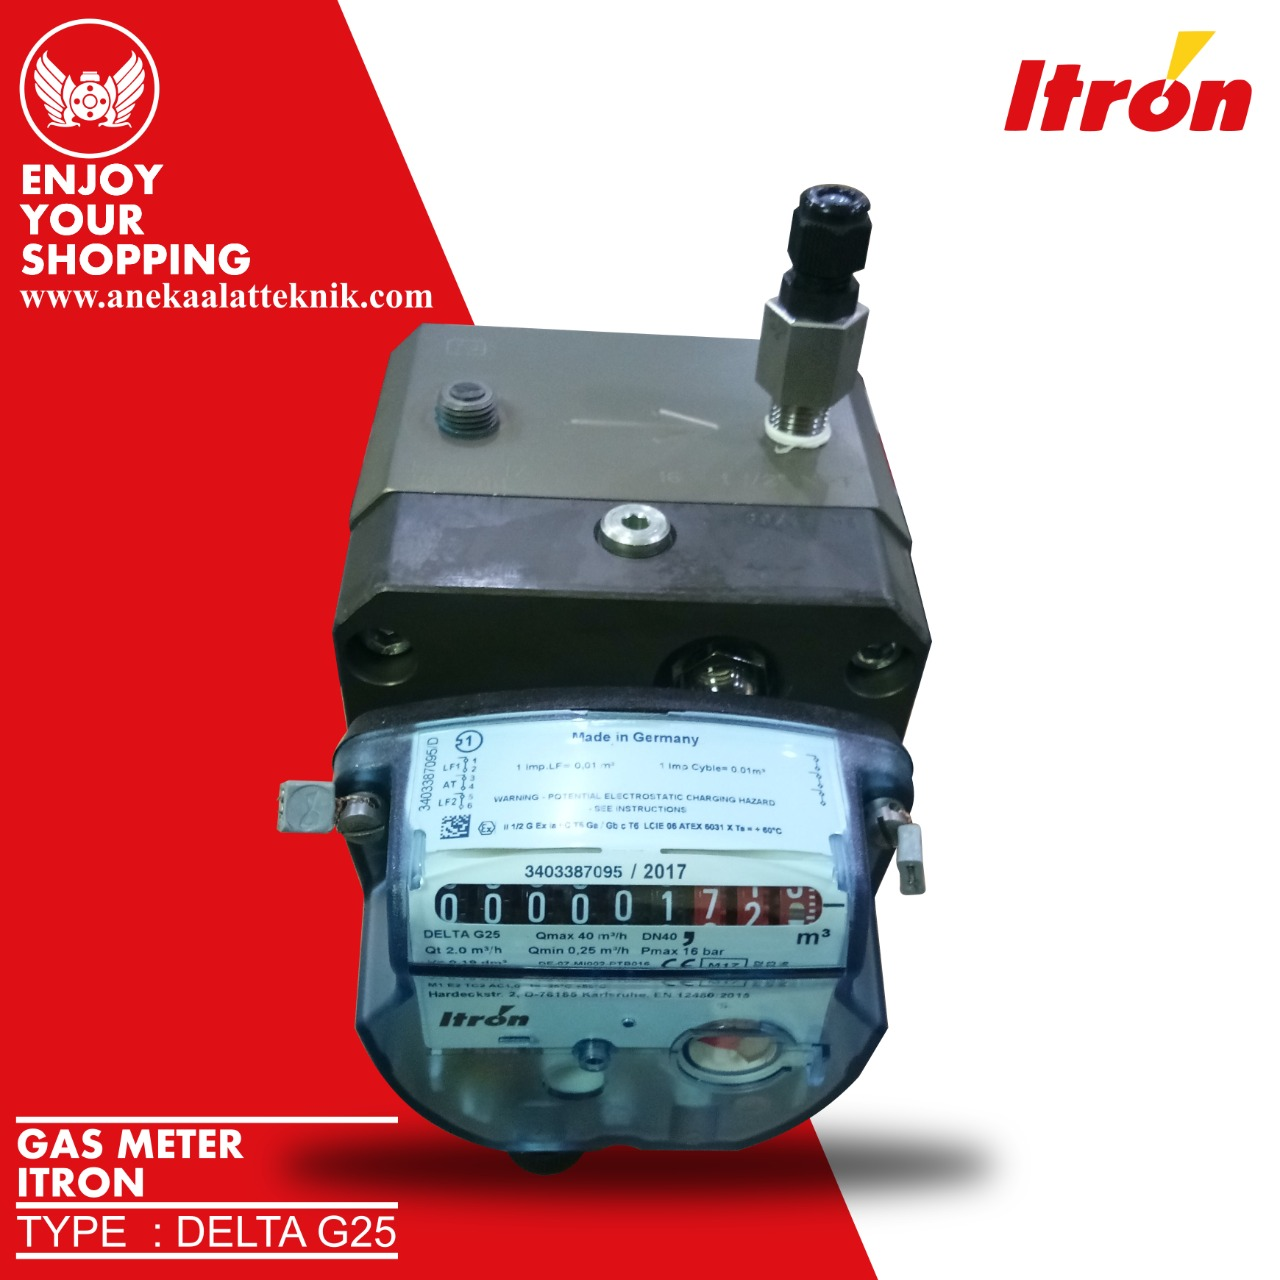 Jual Rotary Meter Delta Itron G16